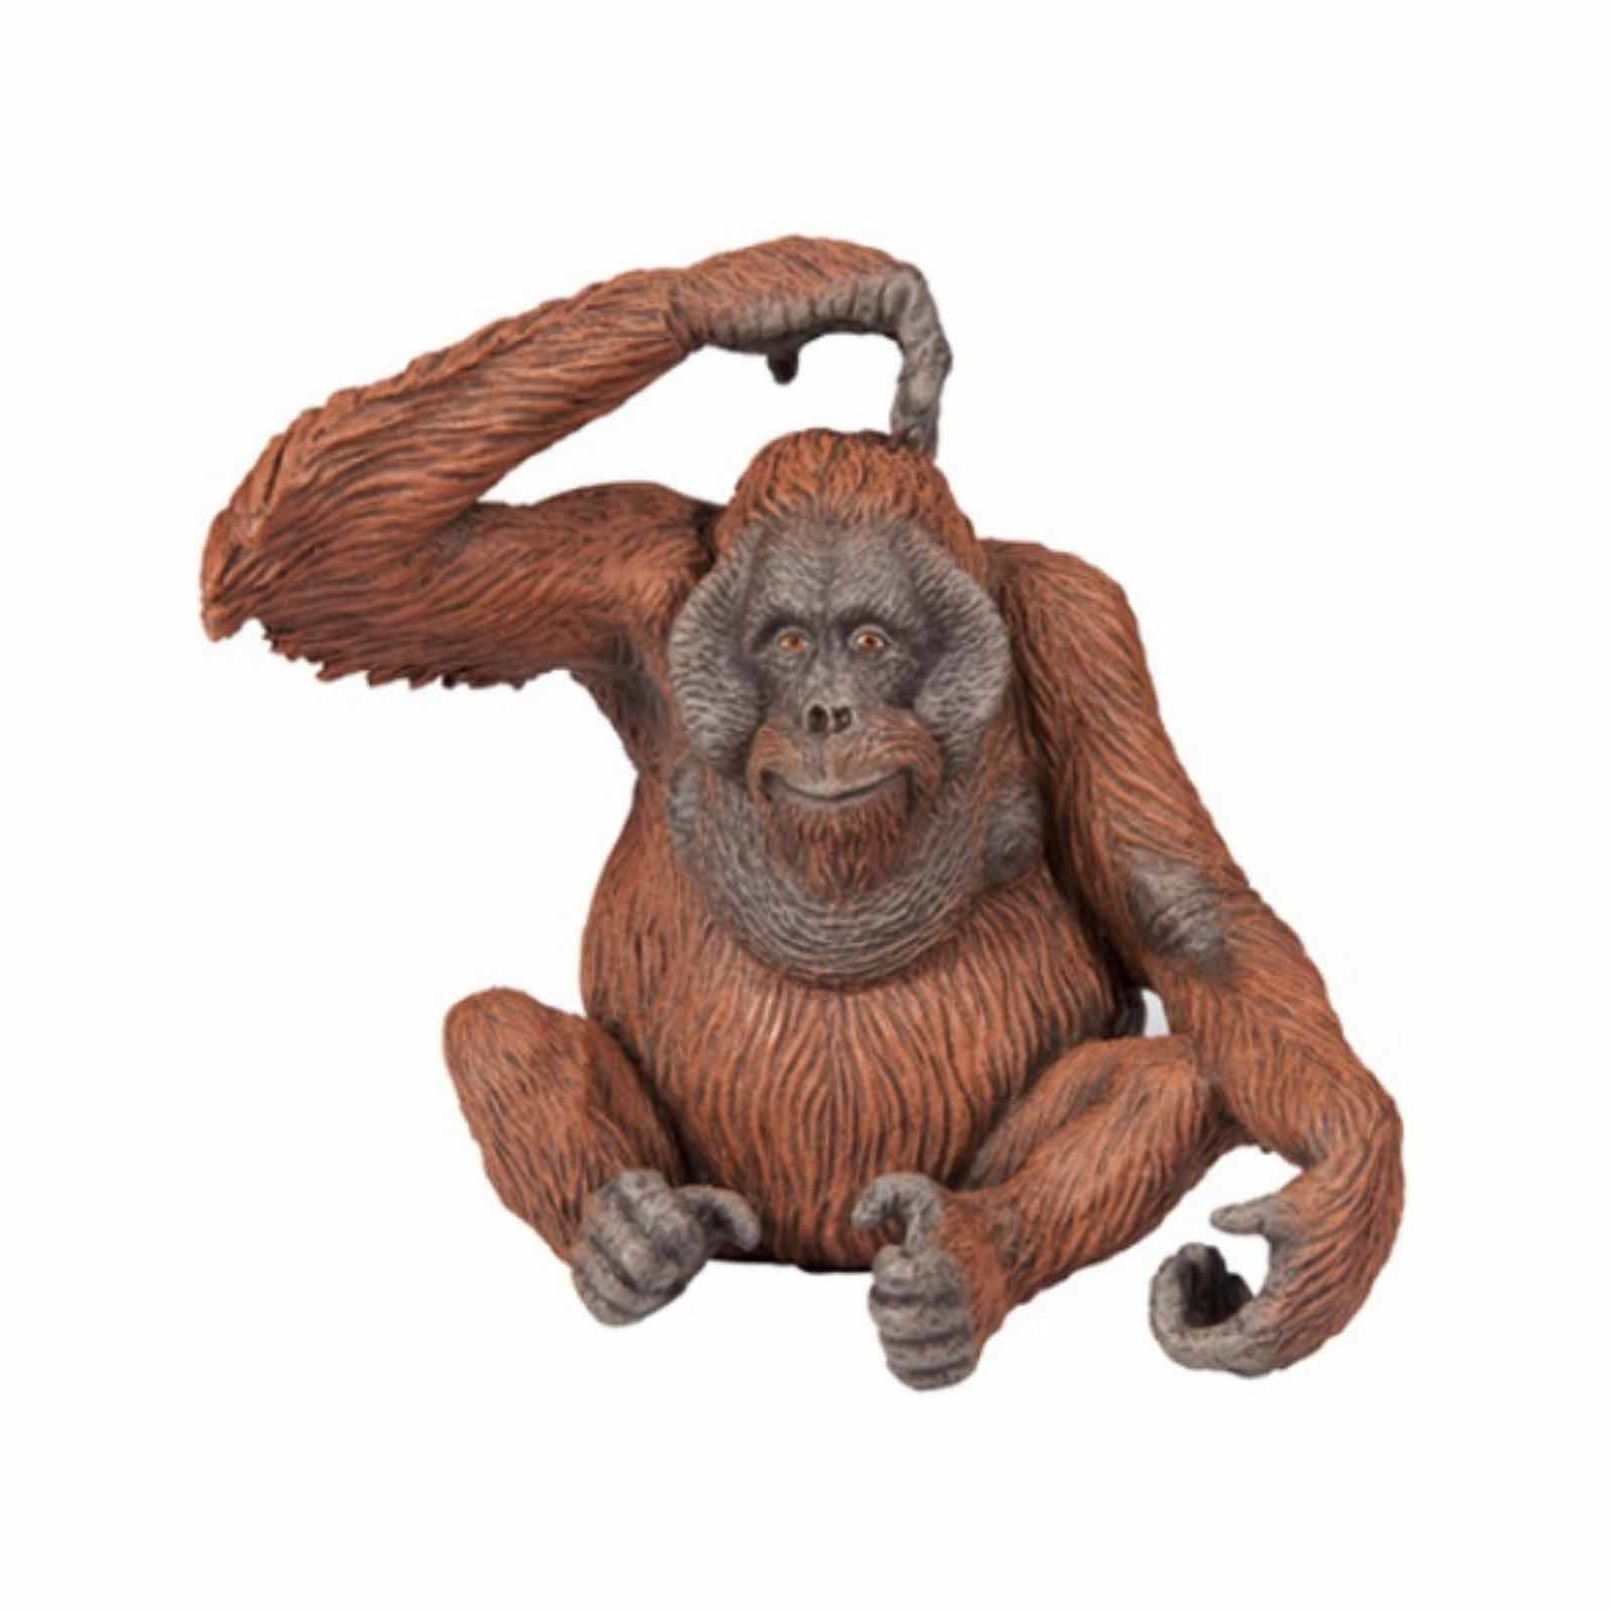 Plastic speelgoed figuur orang-oetan 9 cm